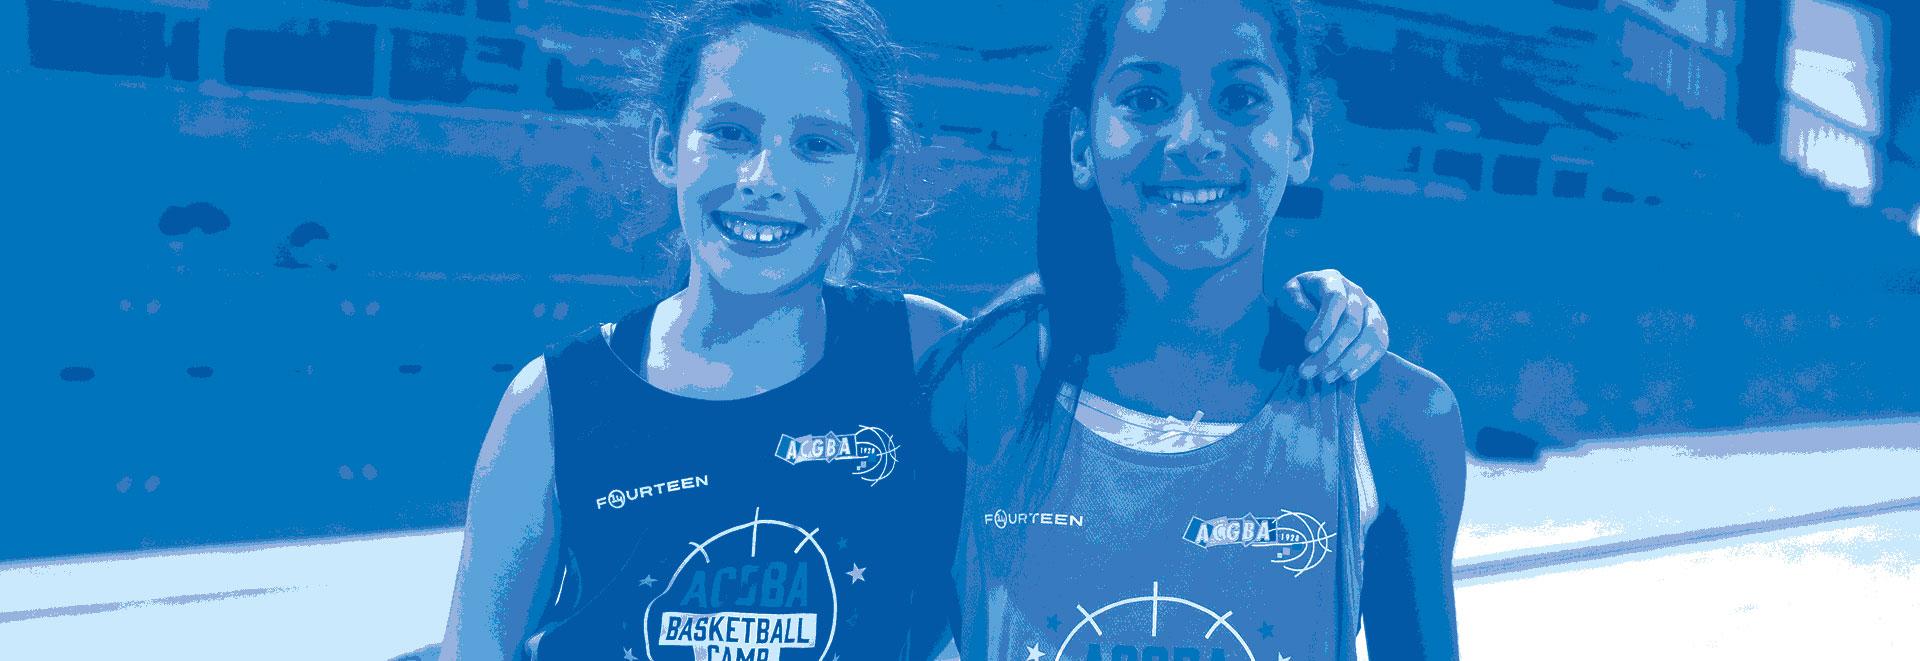 acgba camp basketball automne 2018 - slider